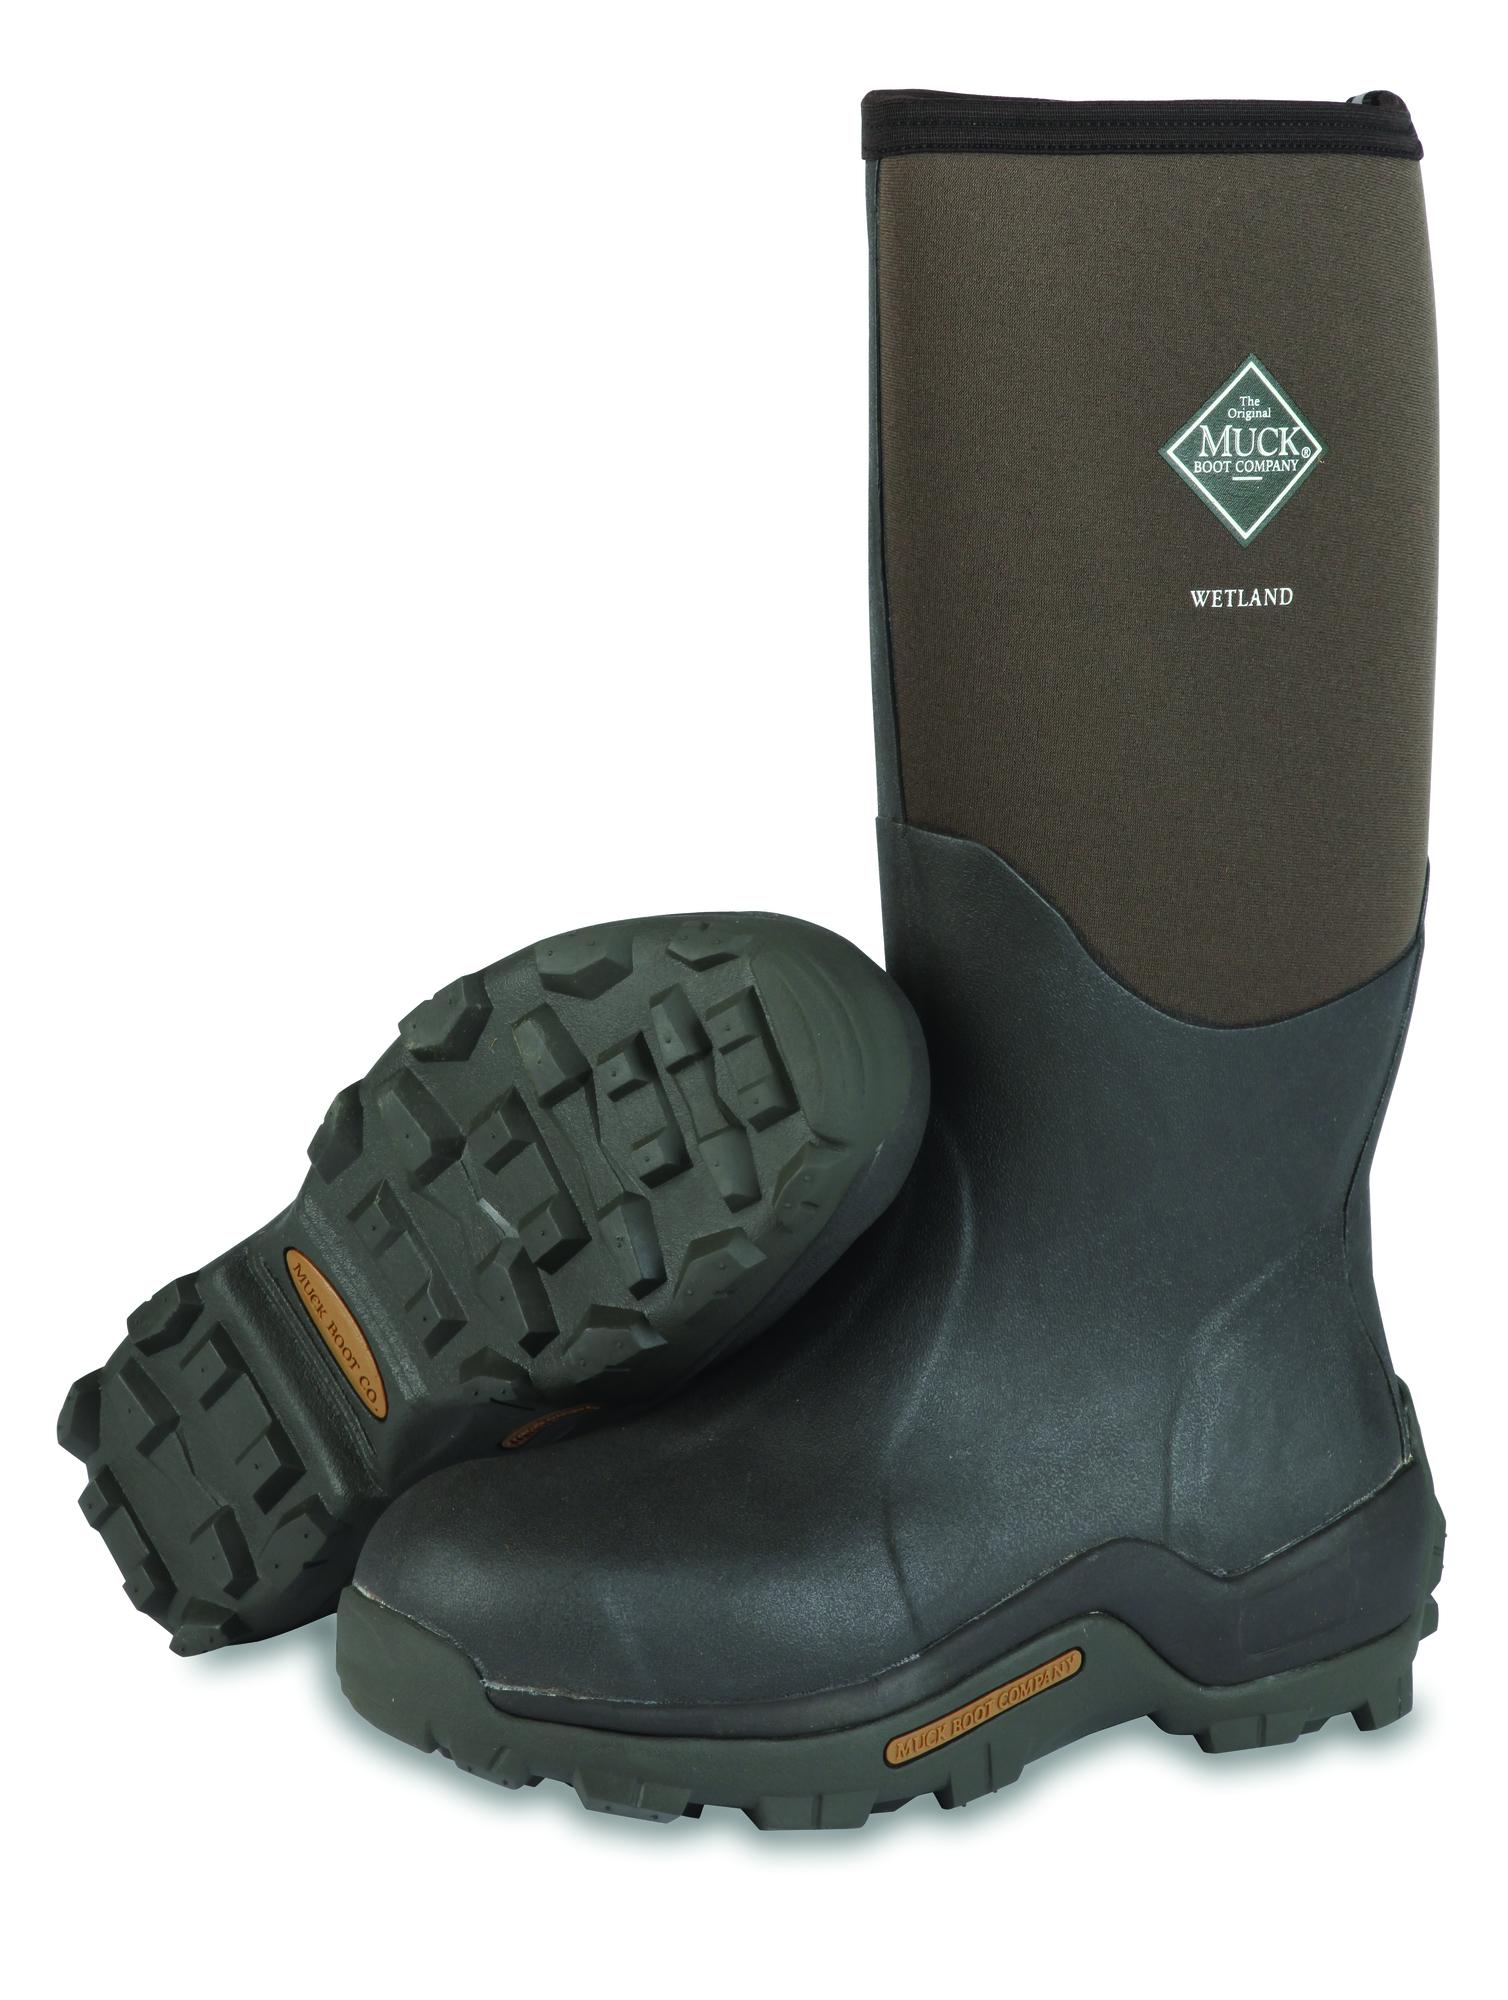 Muck Wetland Boot  <br>  Tan 8